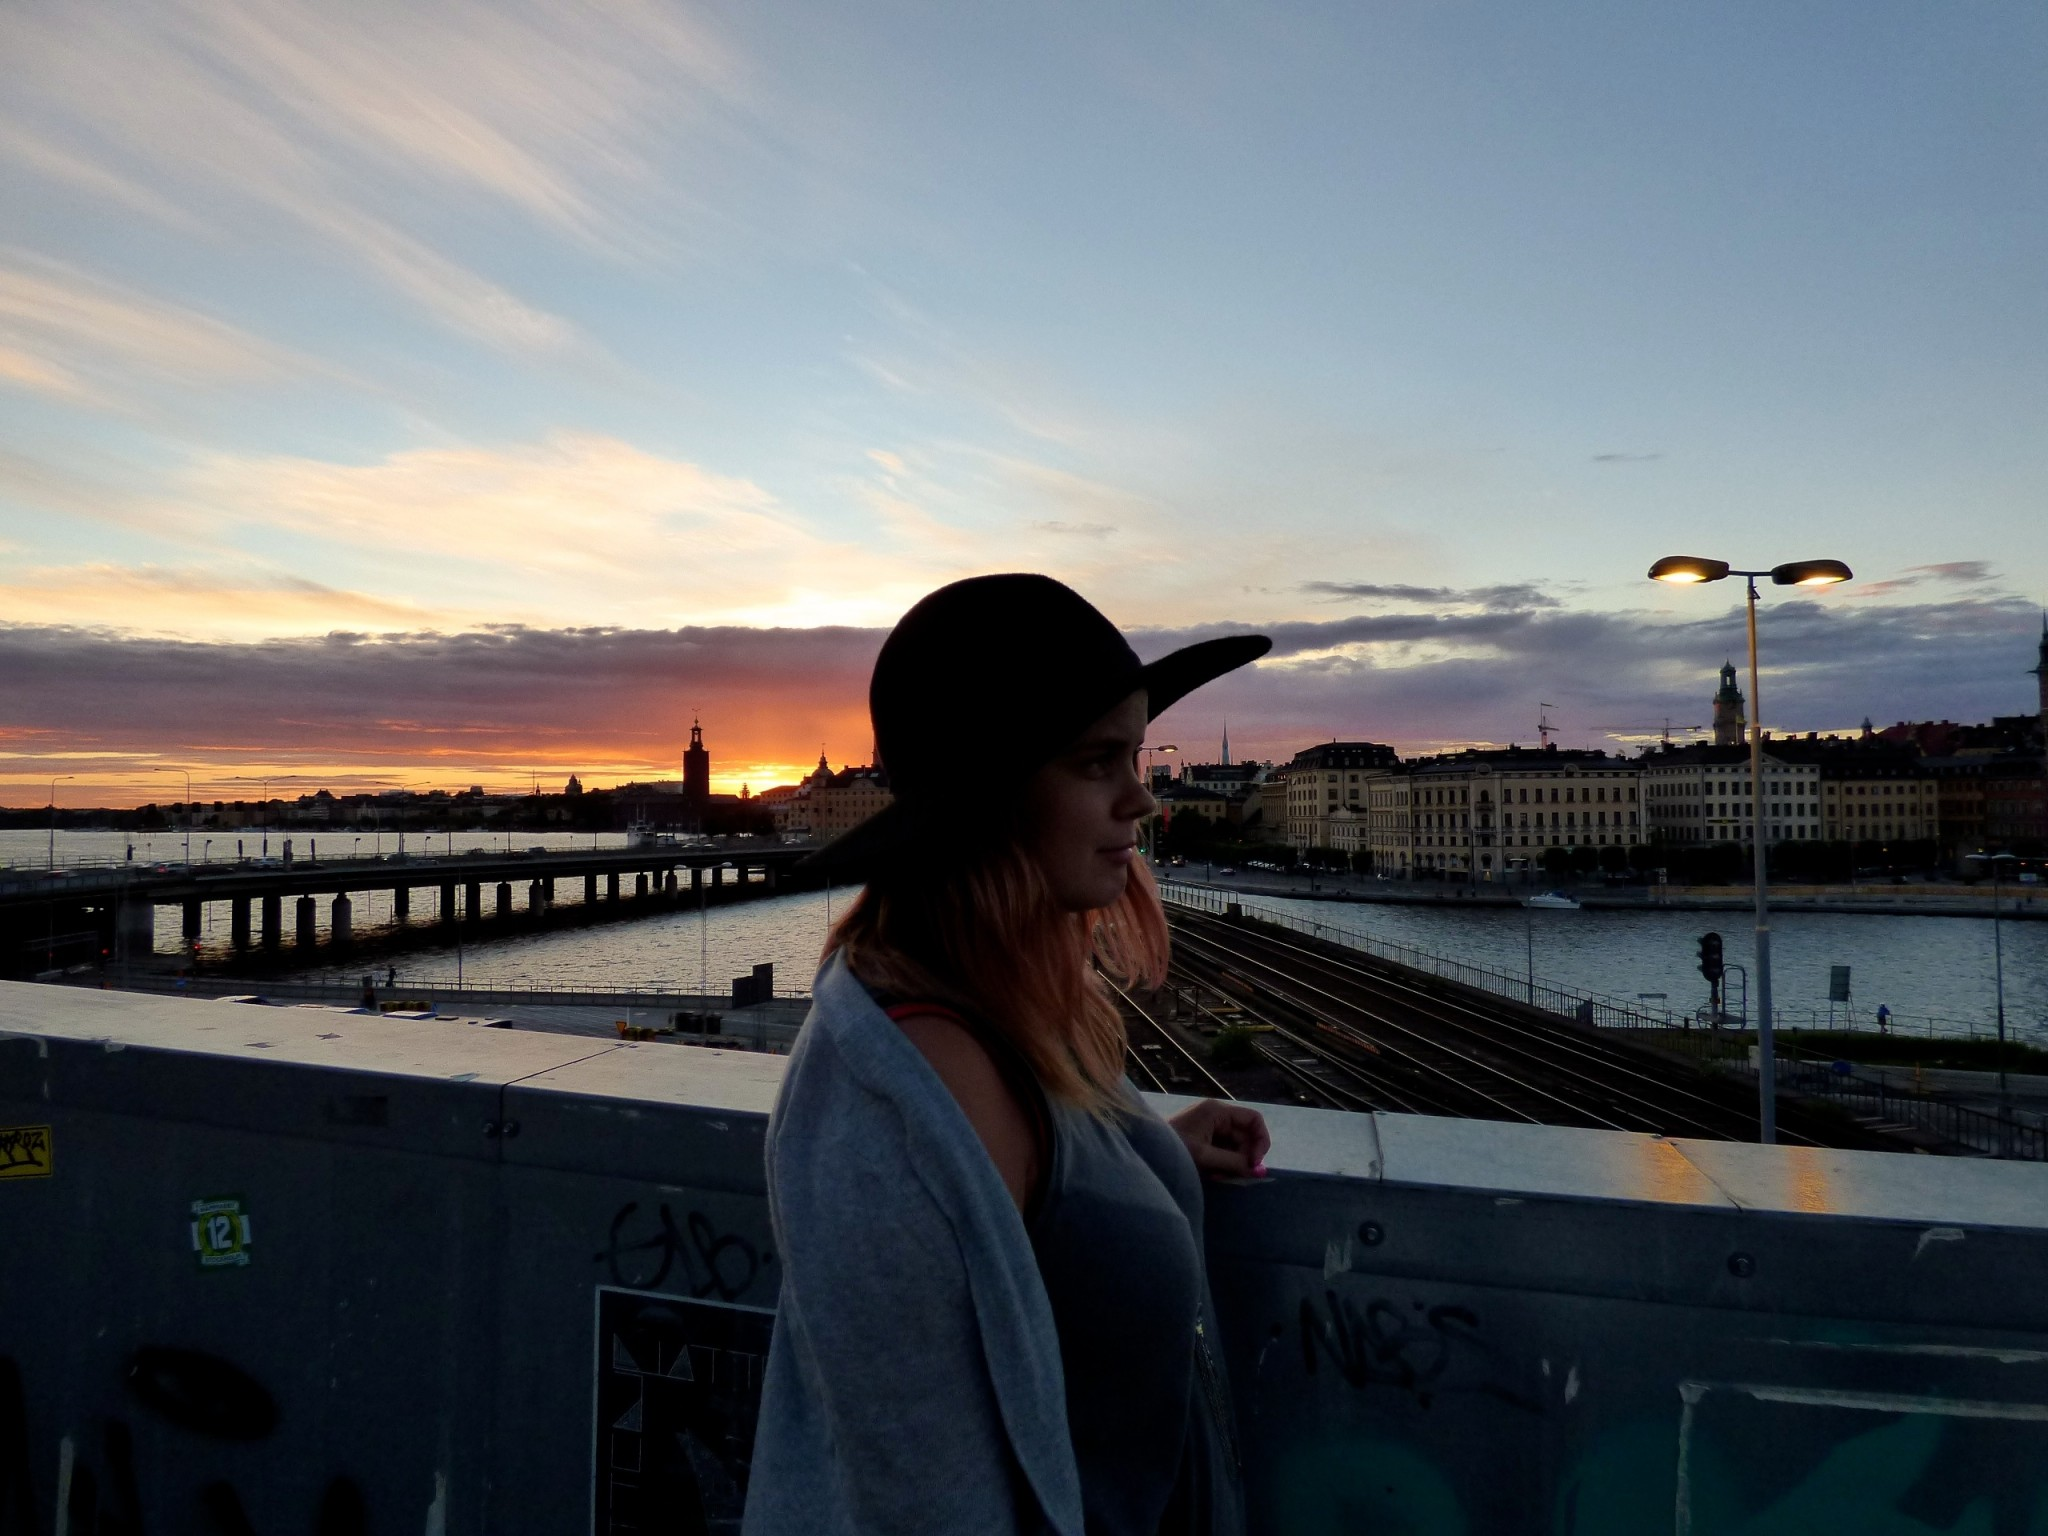 Tukholma auringonlasku